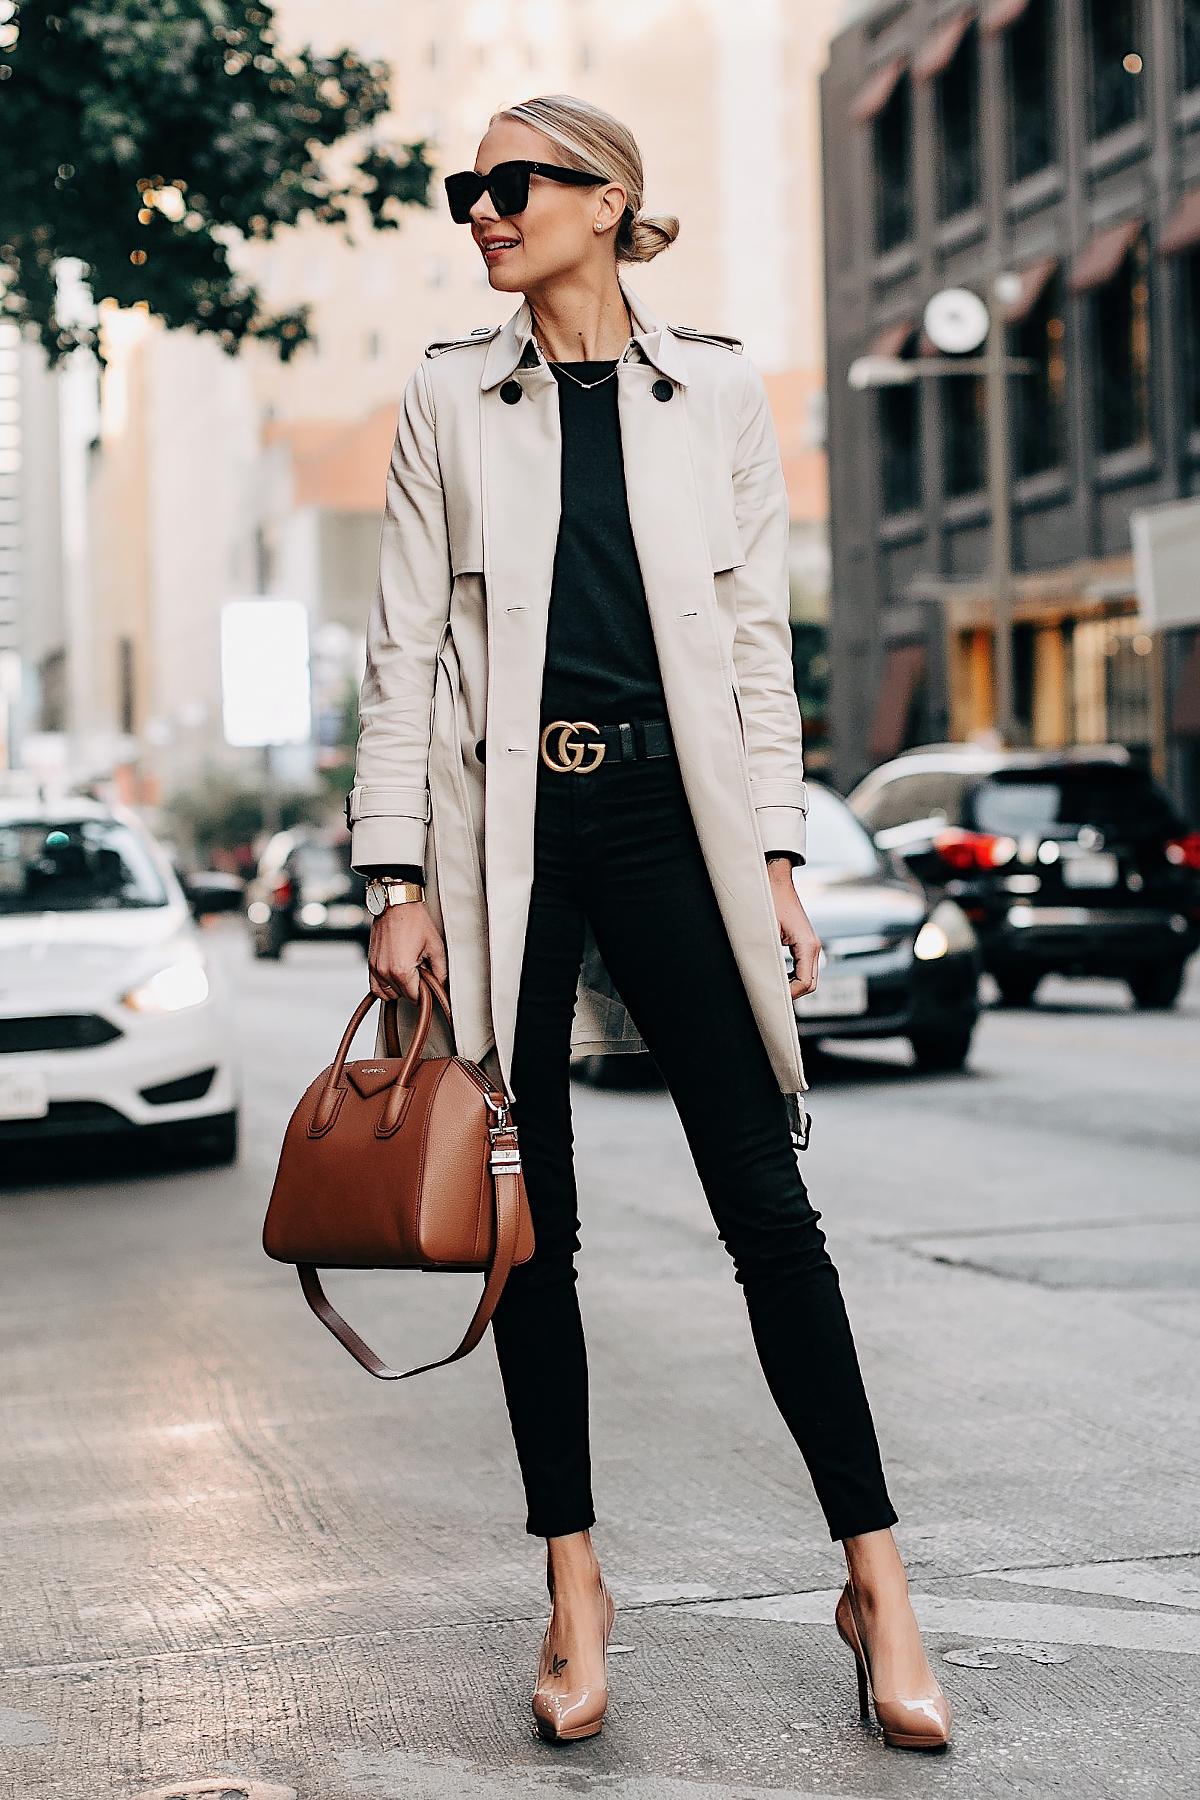 fe77400040e Blonde Woman Wearing Club Monaco Trench Coat Black Sweater Black Skinny  Jeans Gucci Belt Nude Pumps